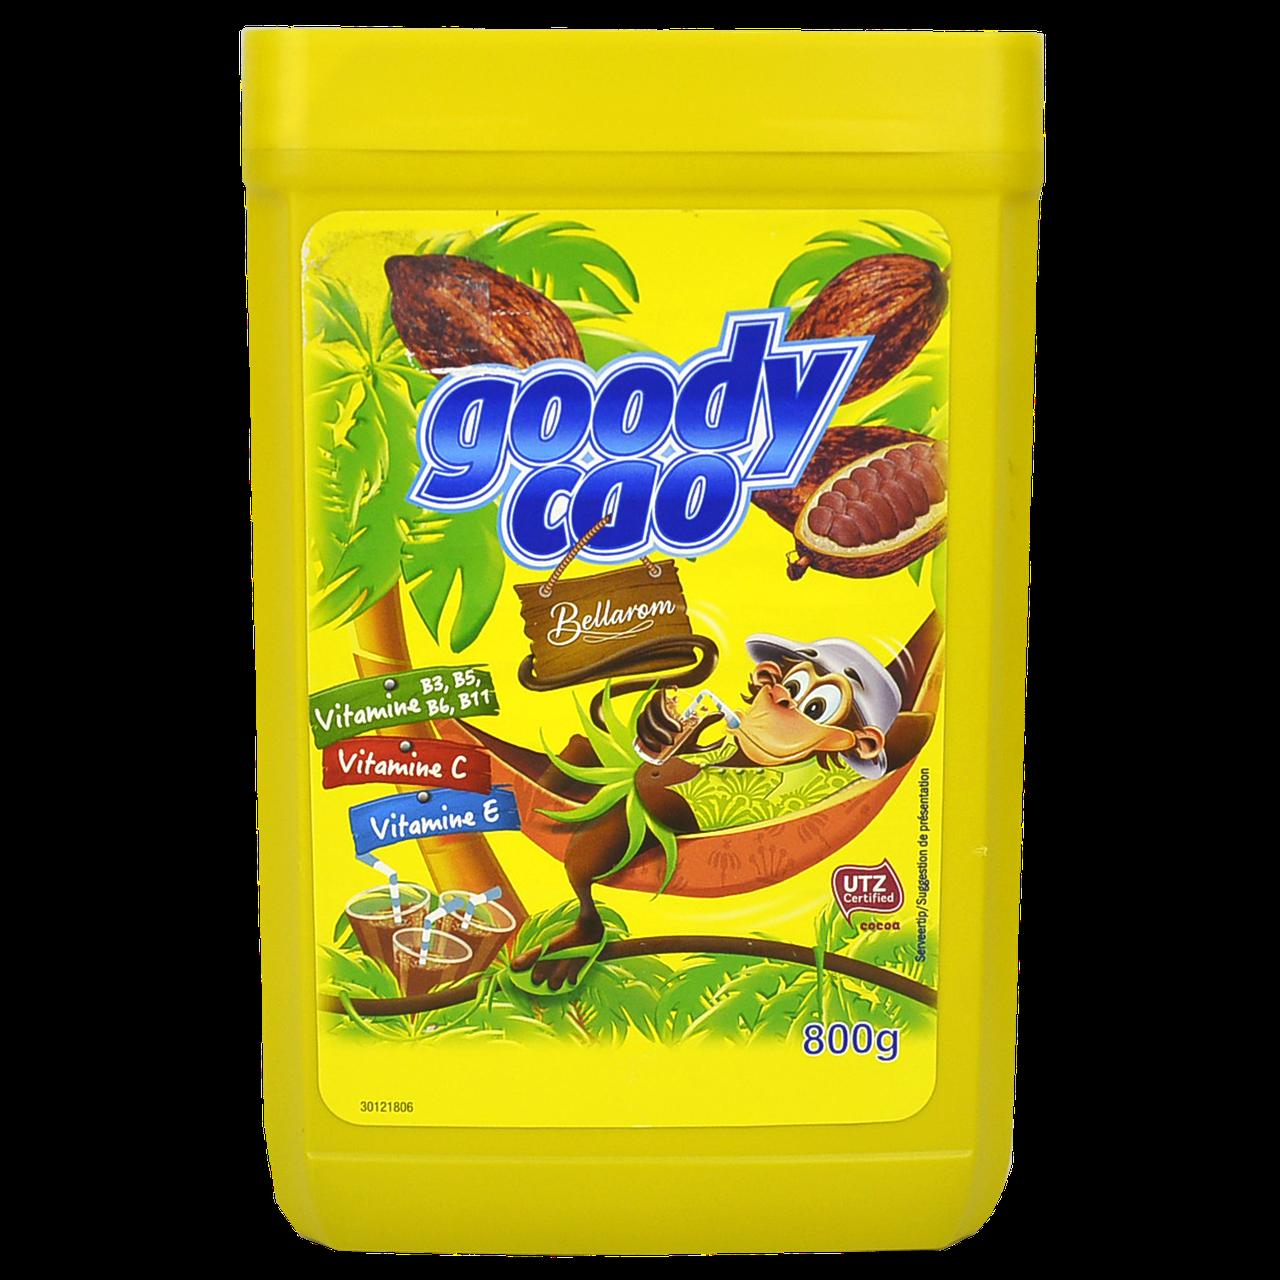 Какао разчинний Goody-cao 800g